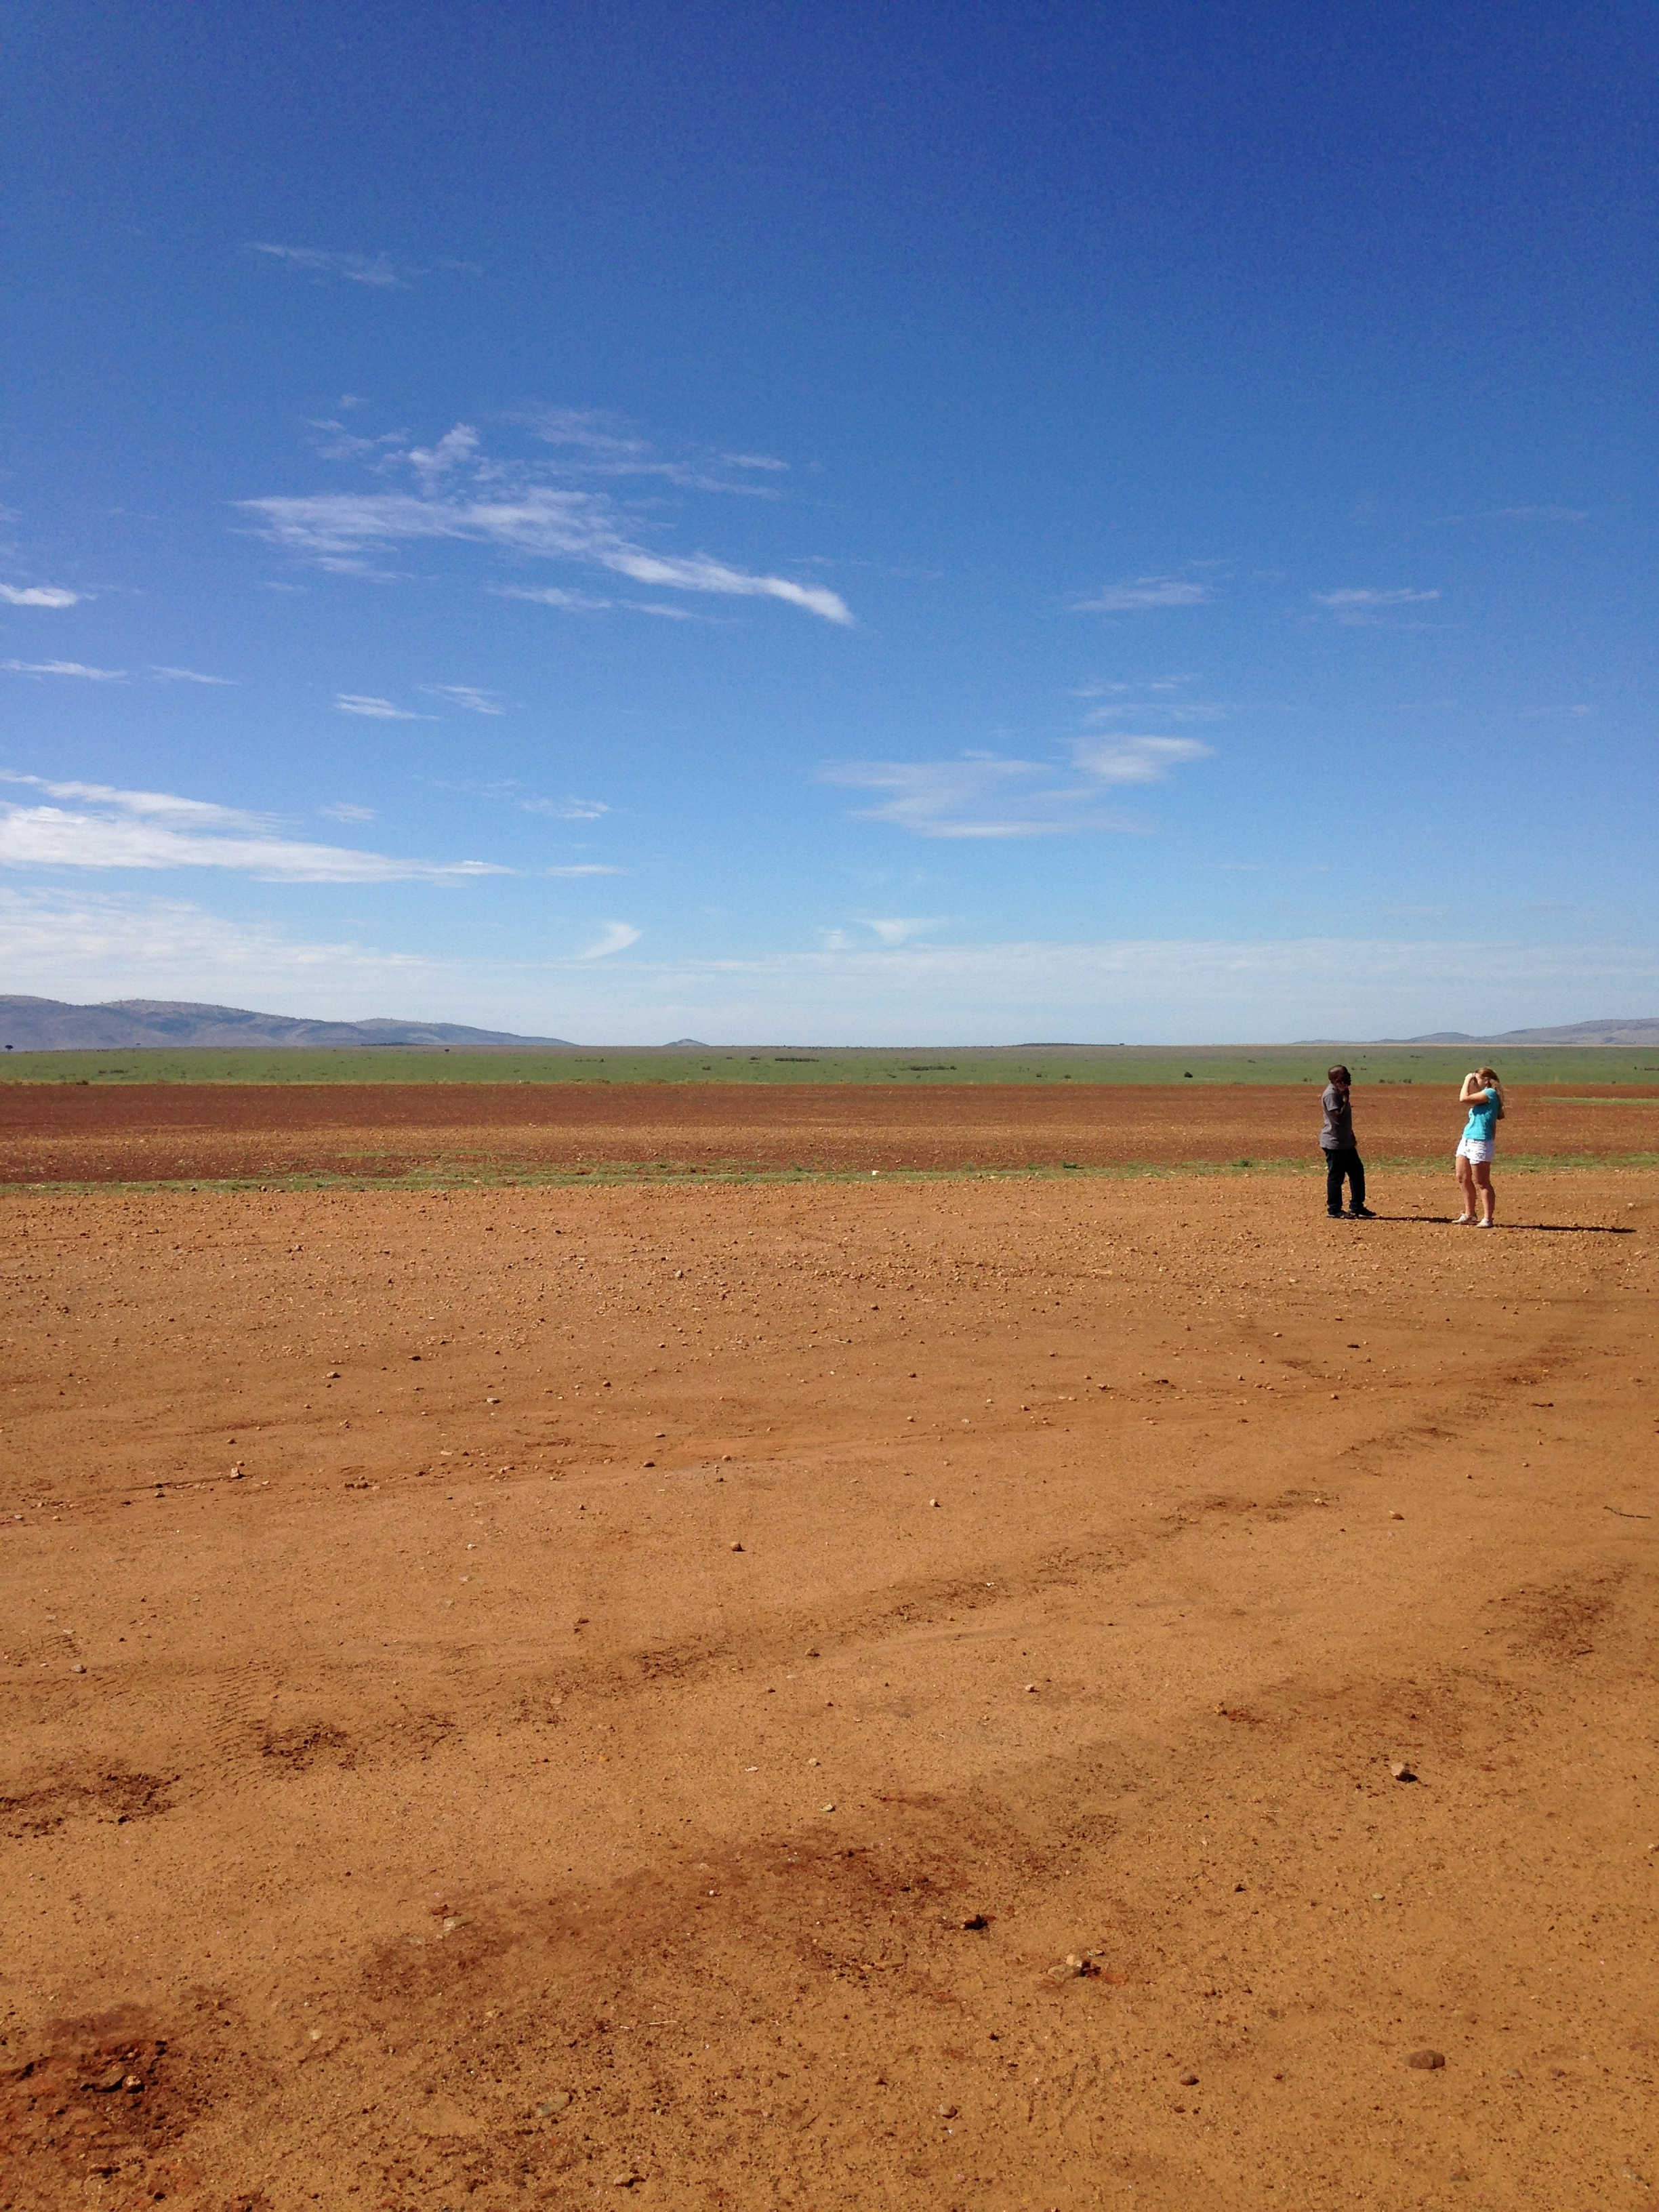 Somewhere in the Masai Mara National Reserve